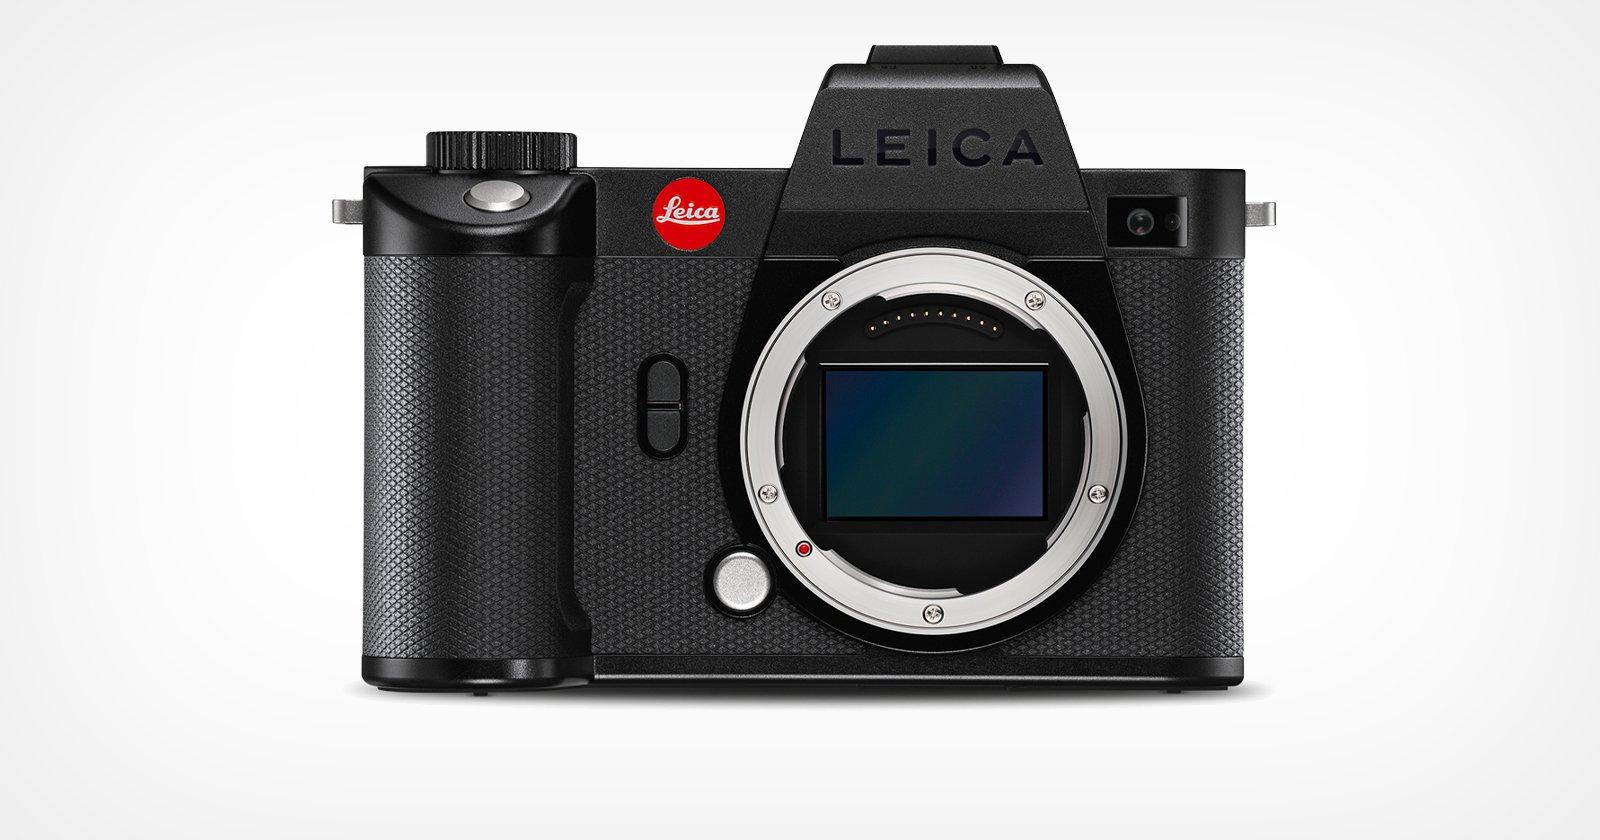 Leica SL2-S is an Action-Focused Camera: 24.6MP BSI Sensor, 25 FPS